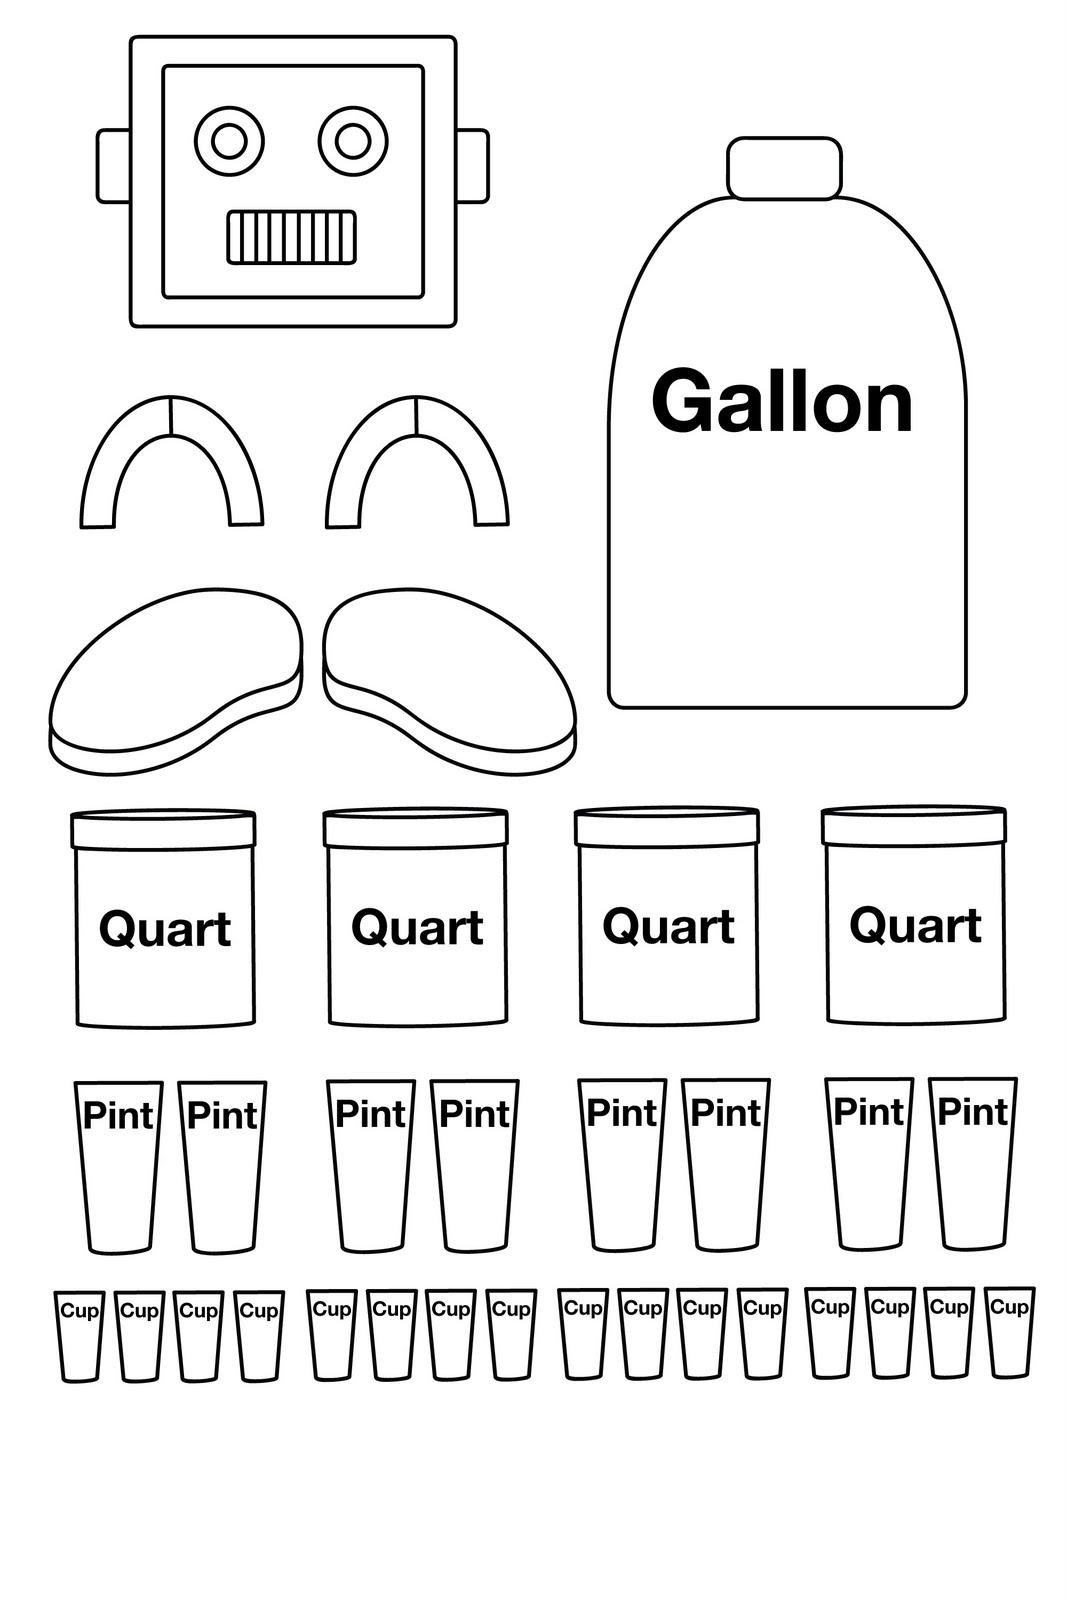 Légend image within gallon man printable